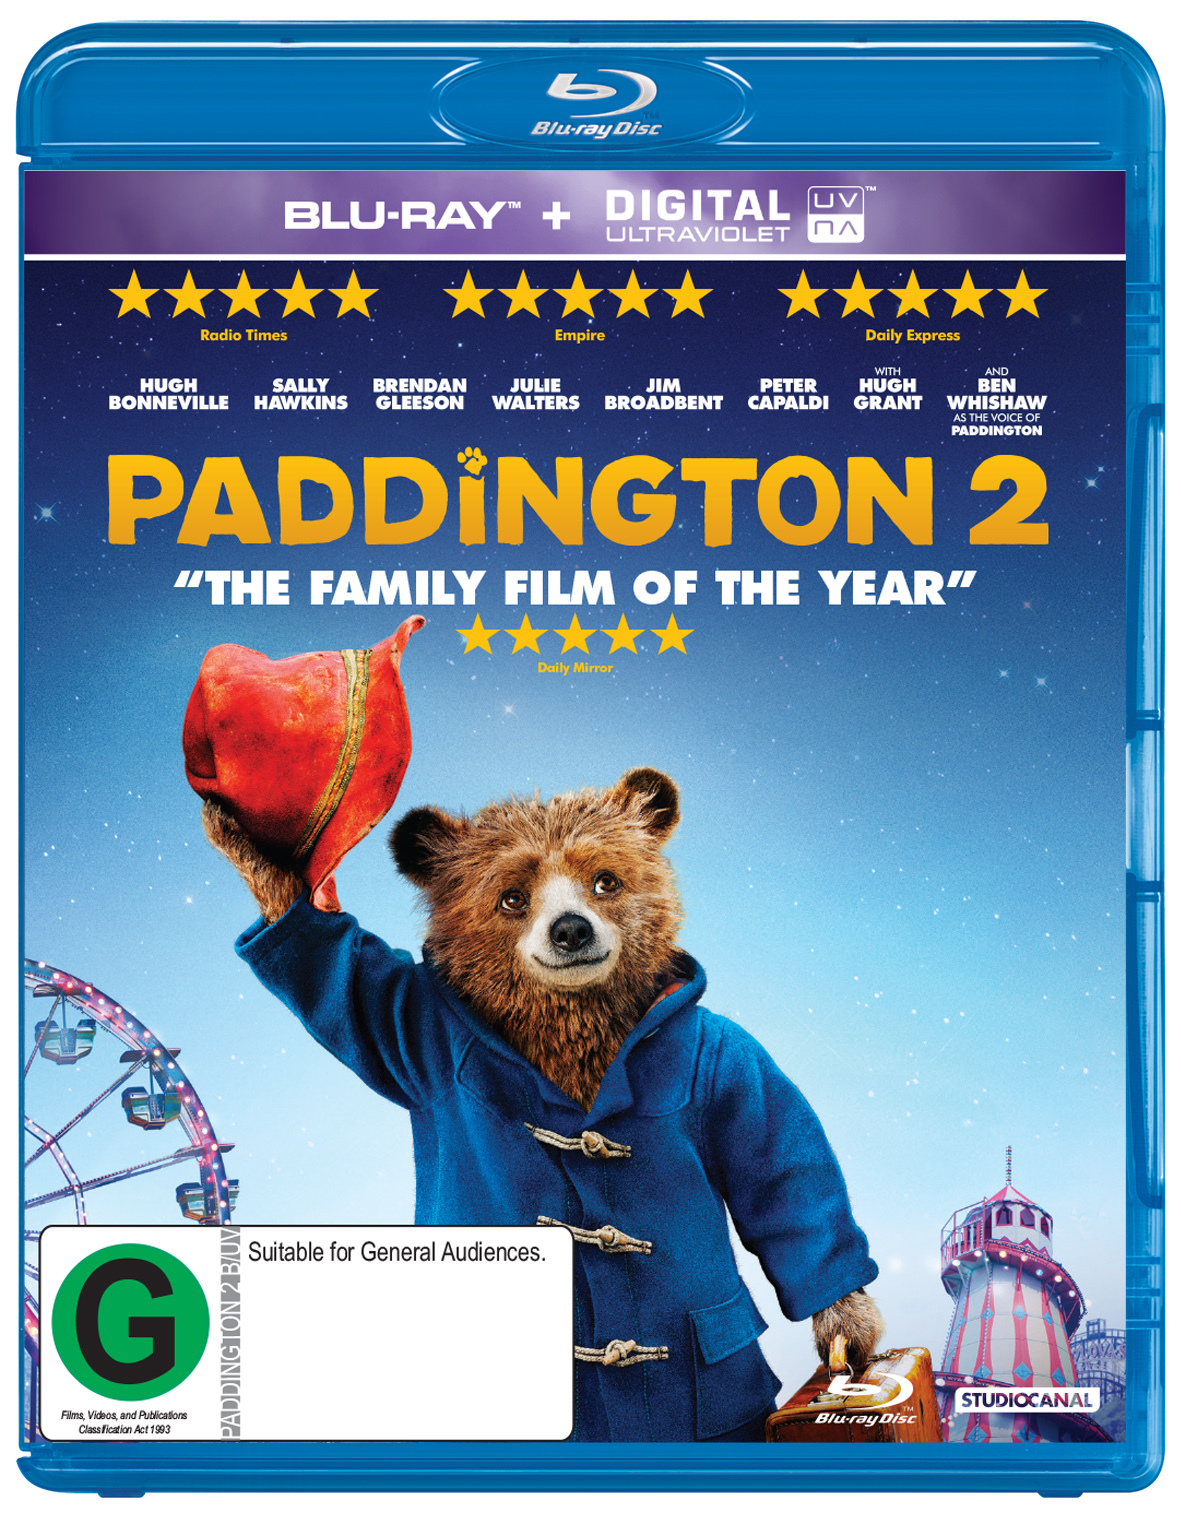 Paddington 2 on Blu-ray image